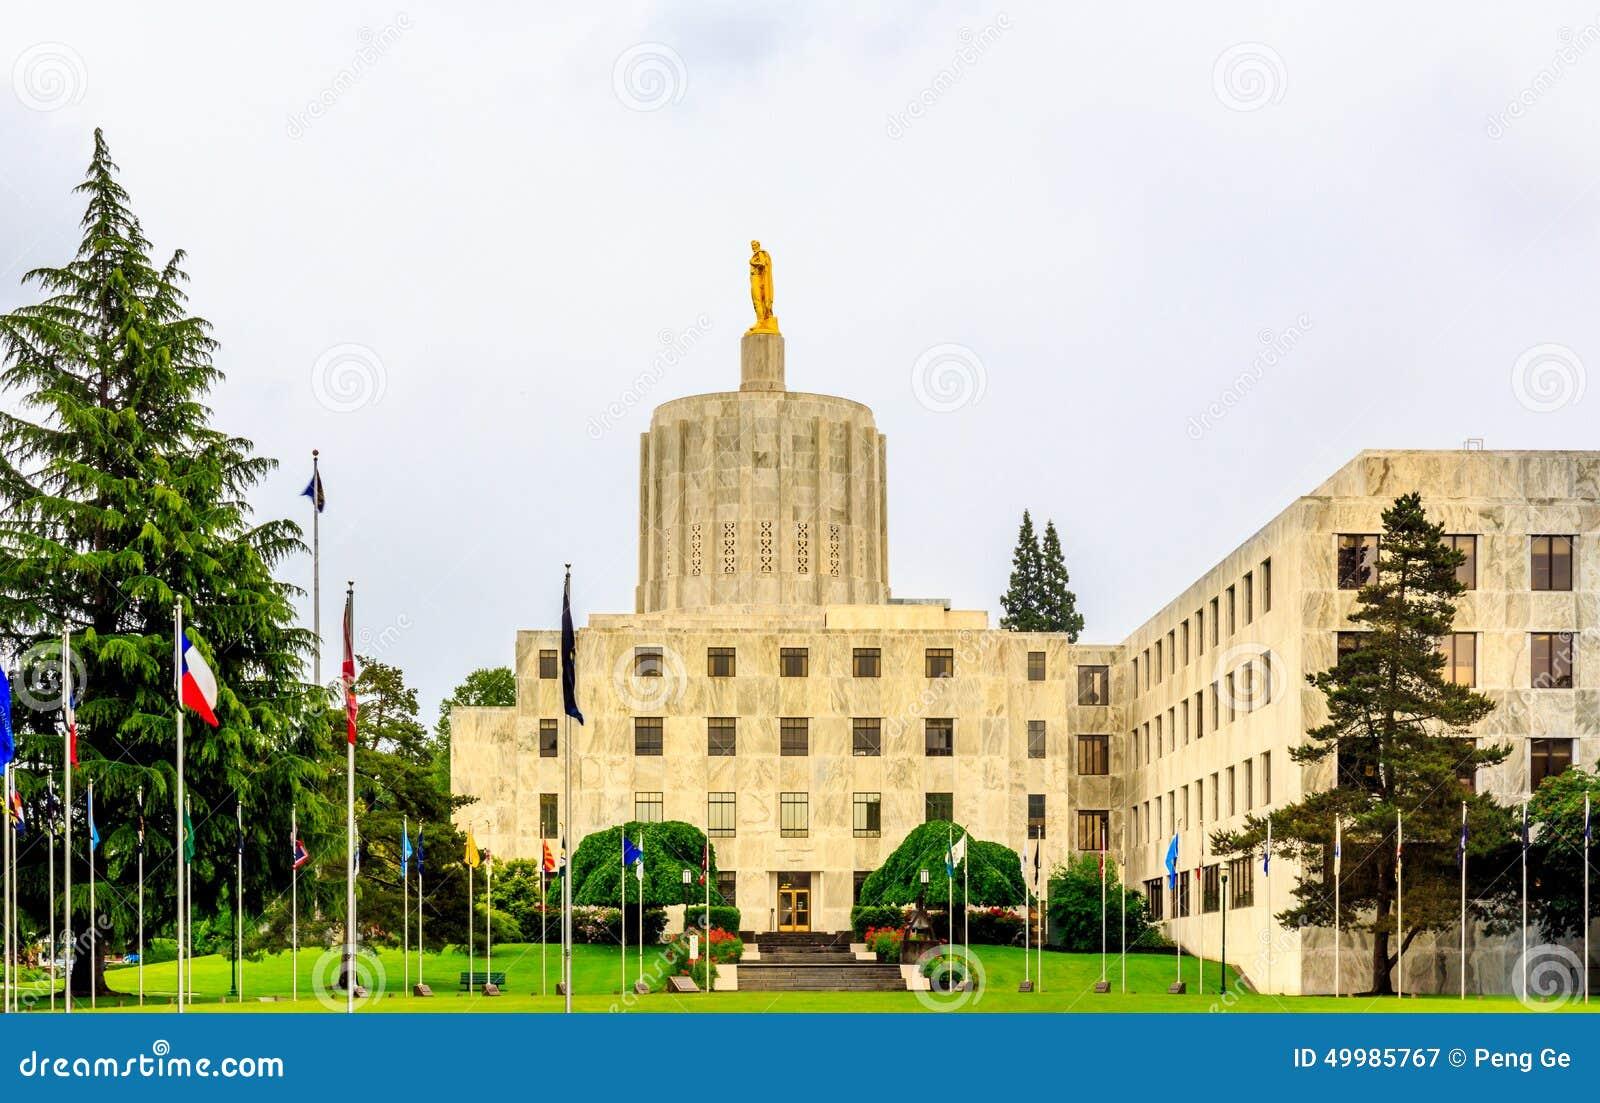 Staat Oregons-Kapitol-Gebäude